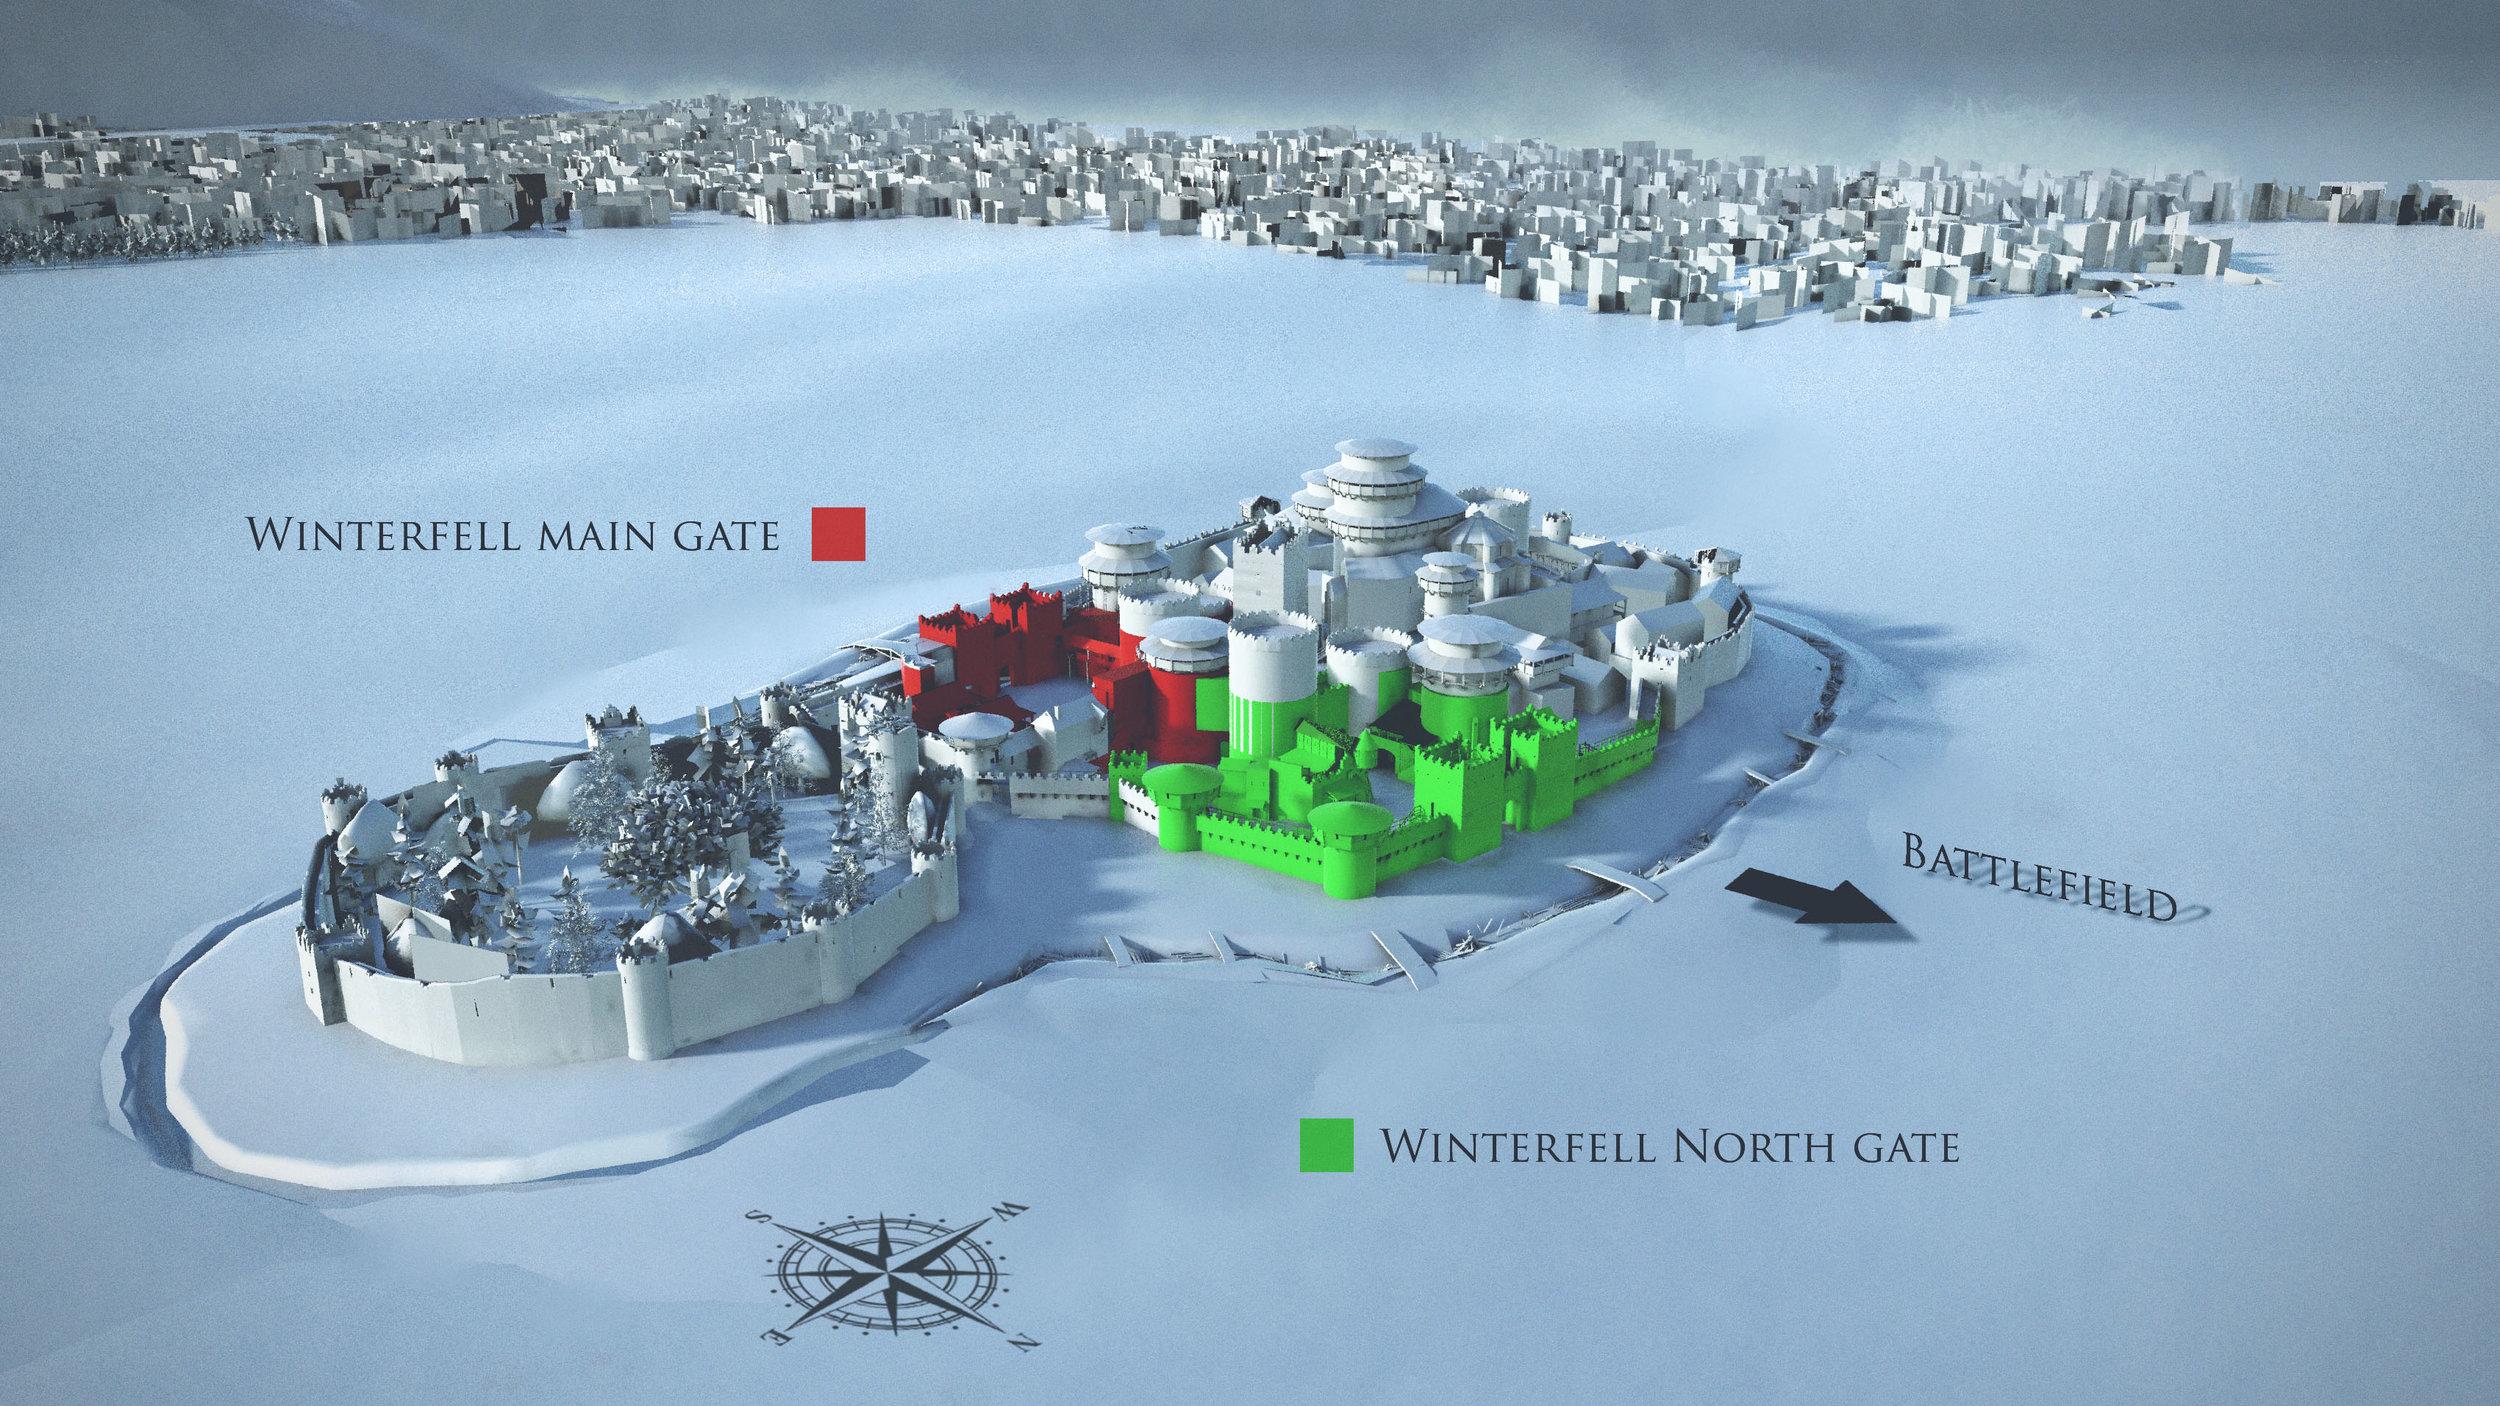 winterfell_threequarter_001.JPG